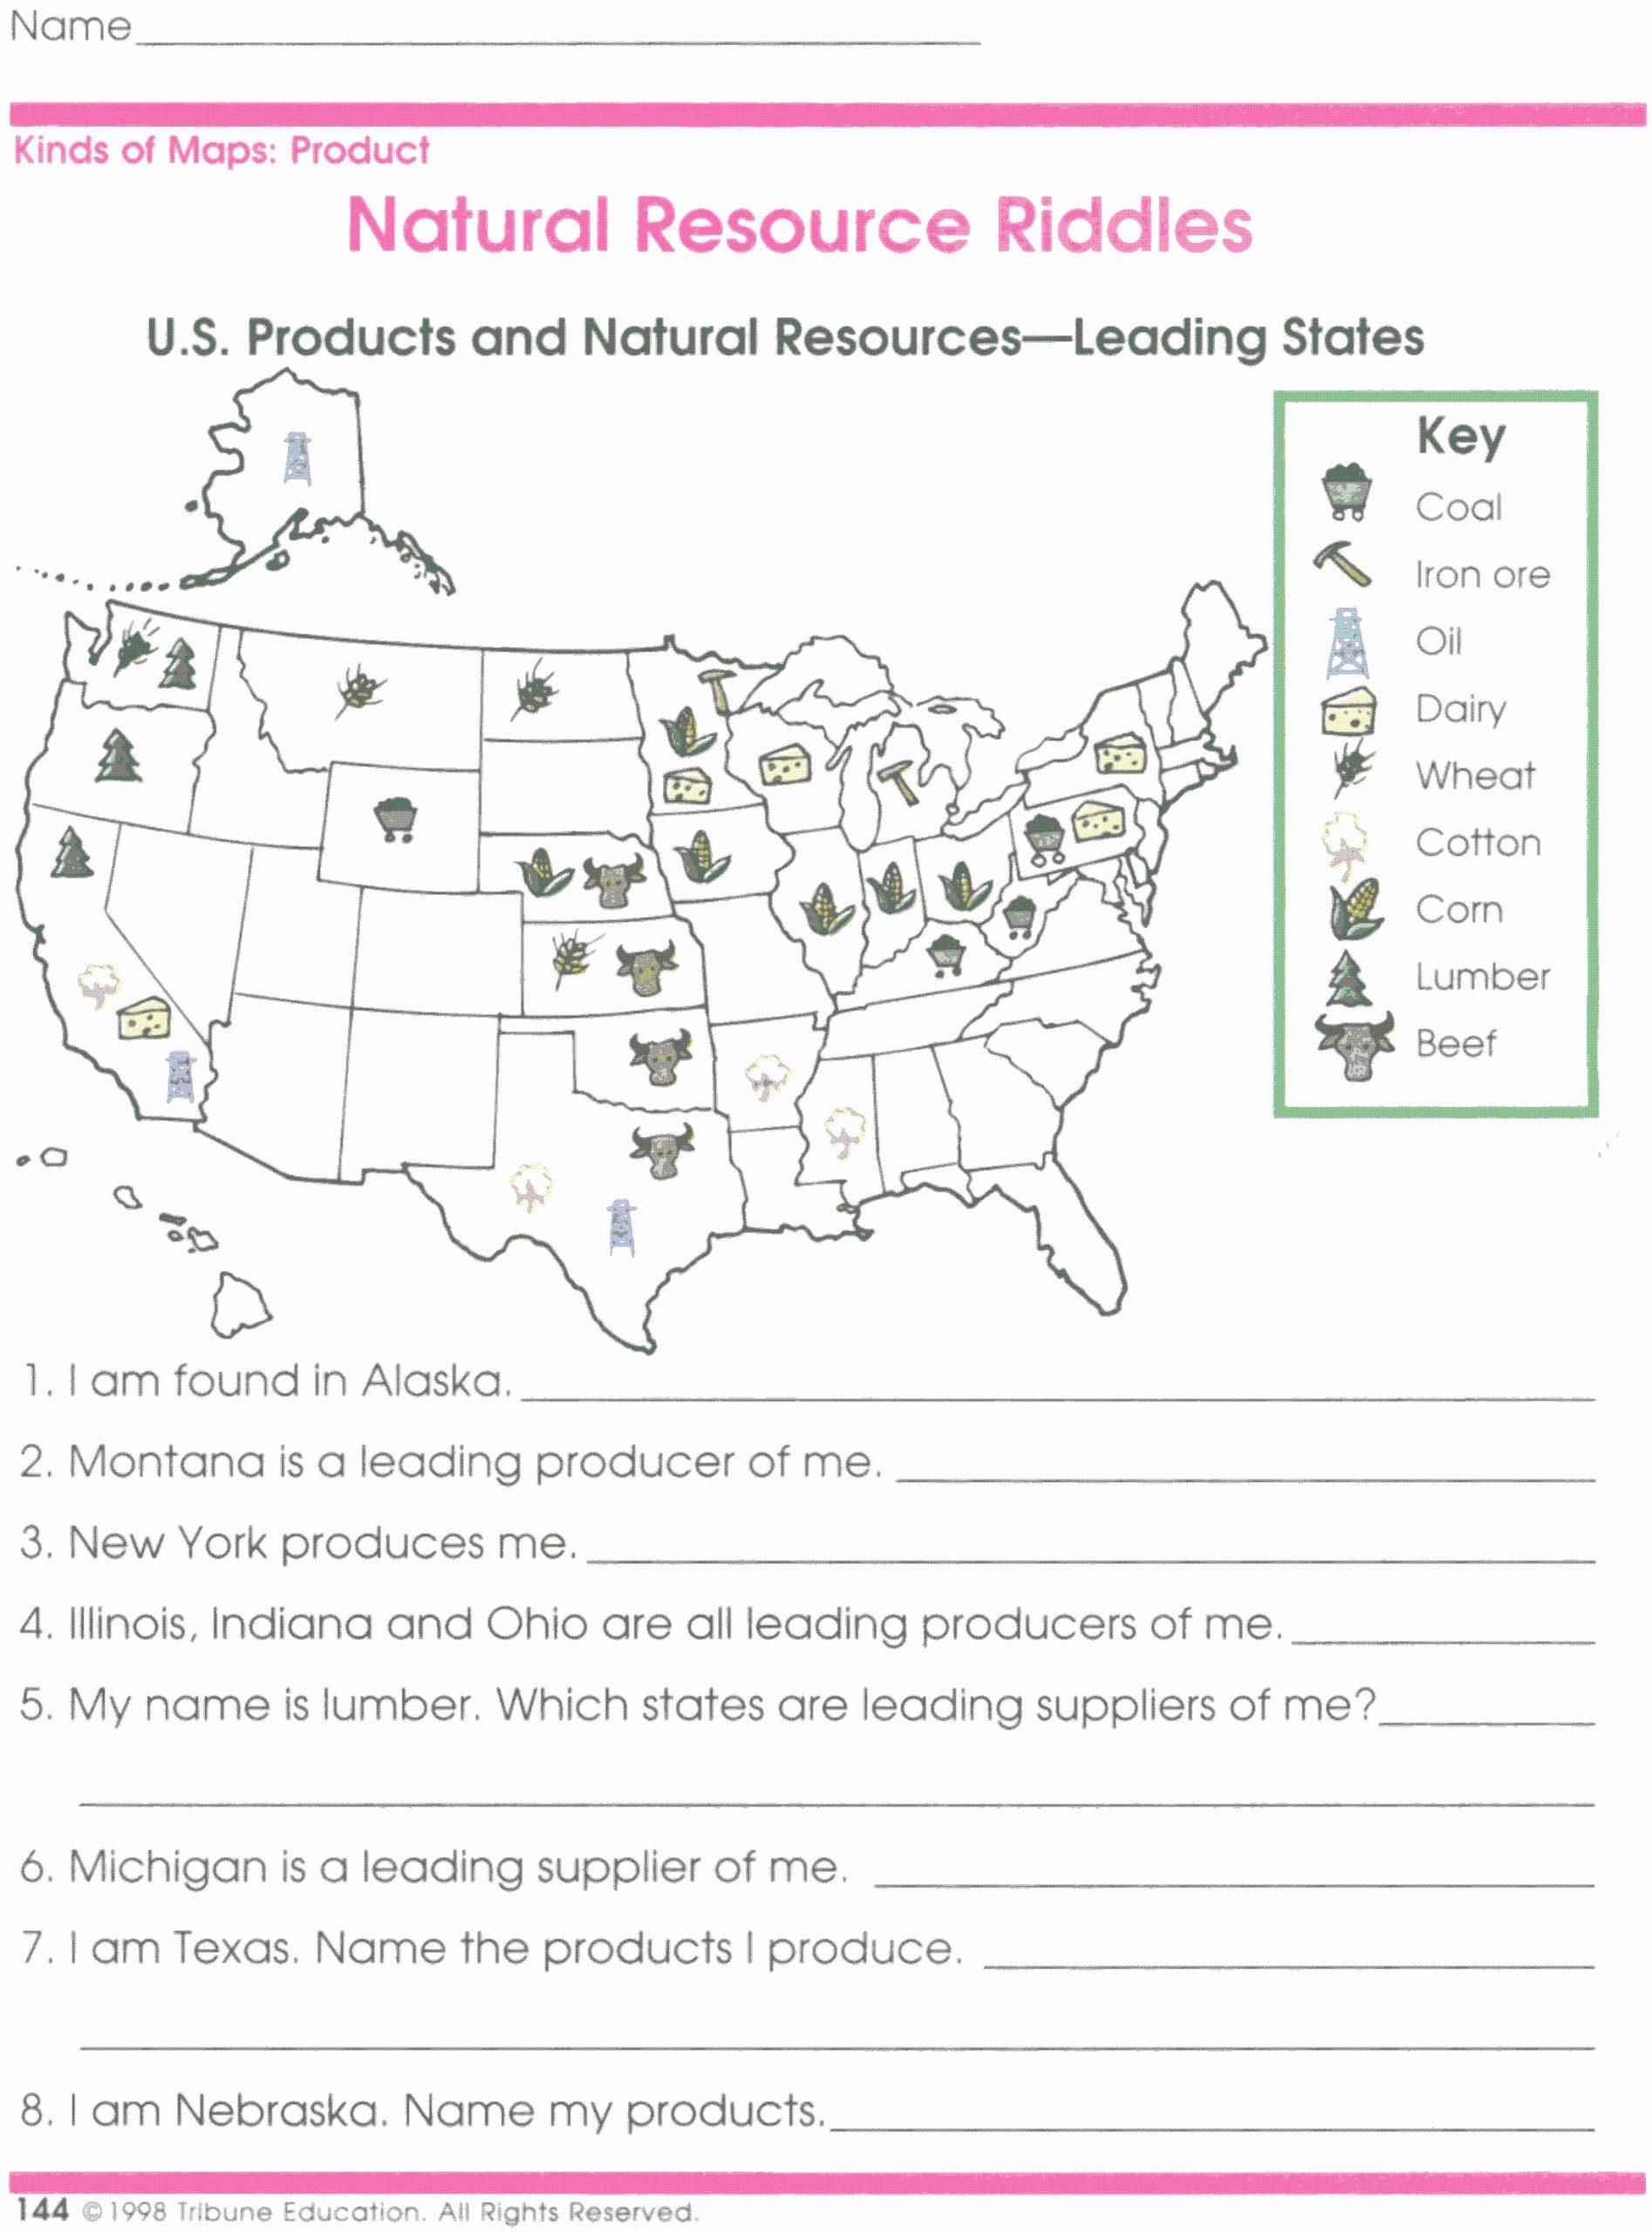 4th Grade Map Skills Worksheets Elegant 10 Inspirational Printable Map Skills Worksheets for 4th